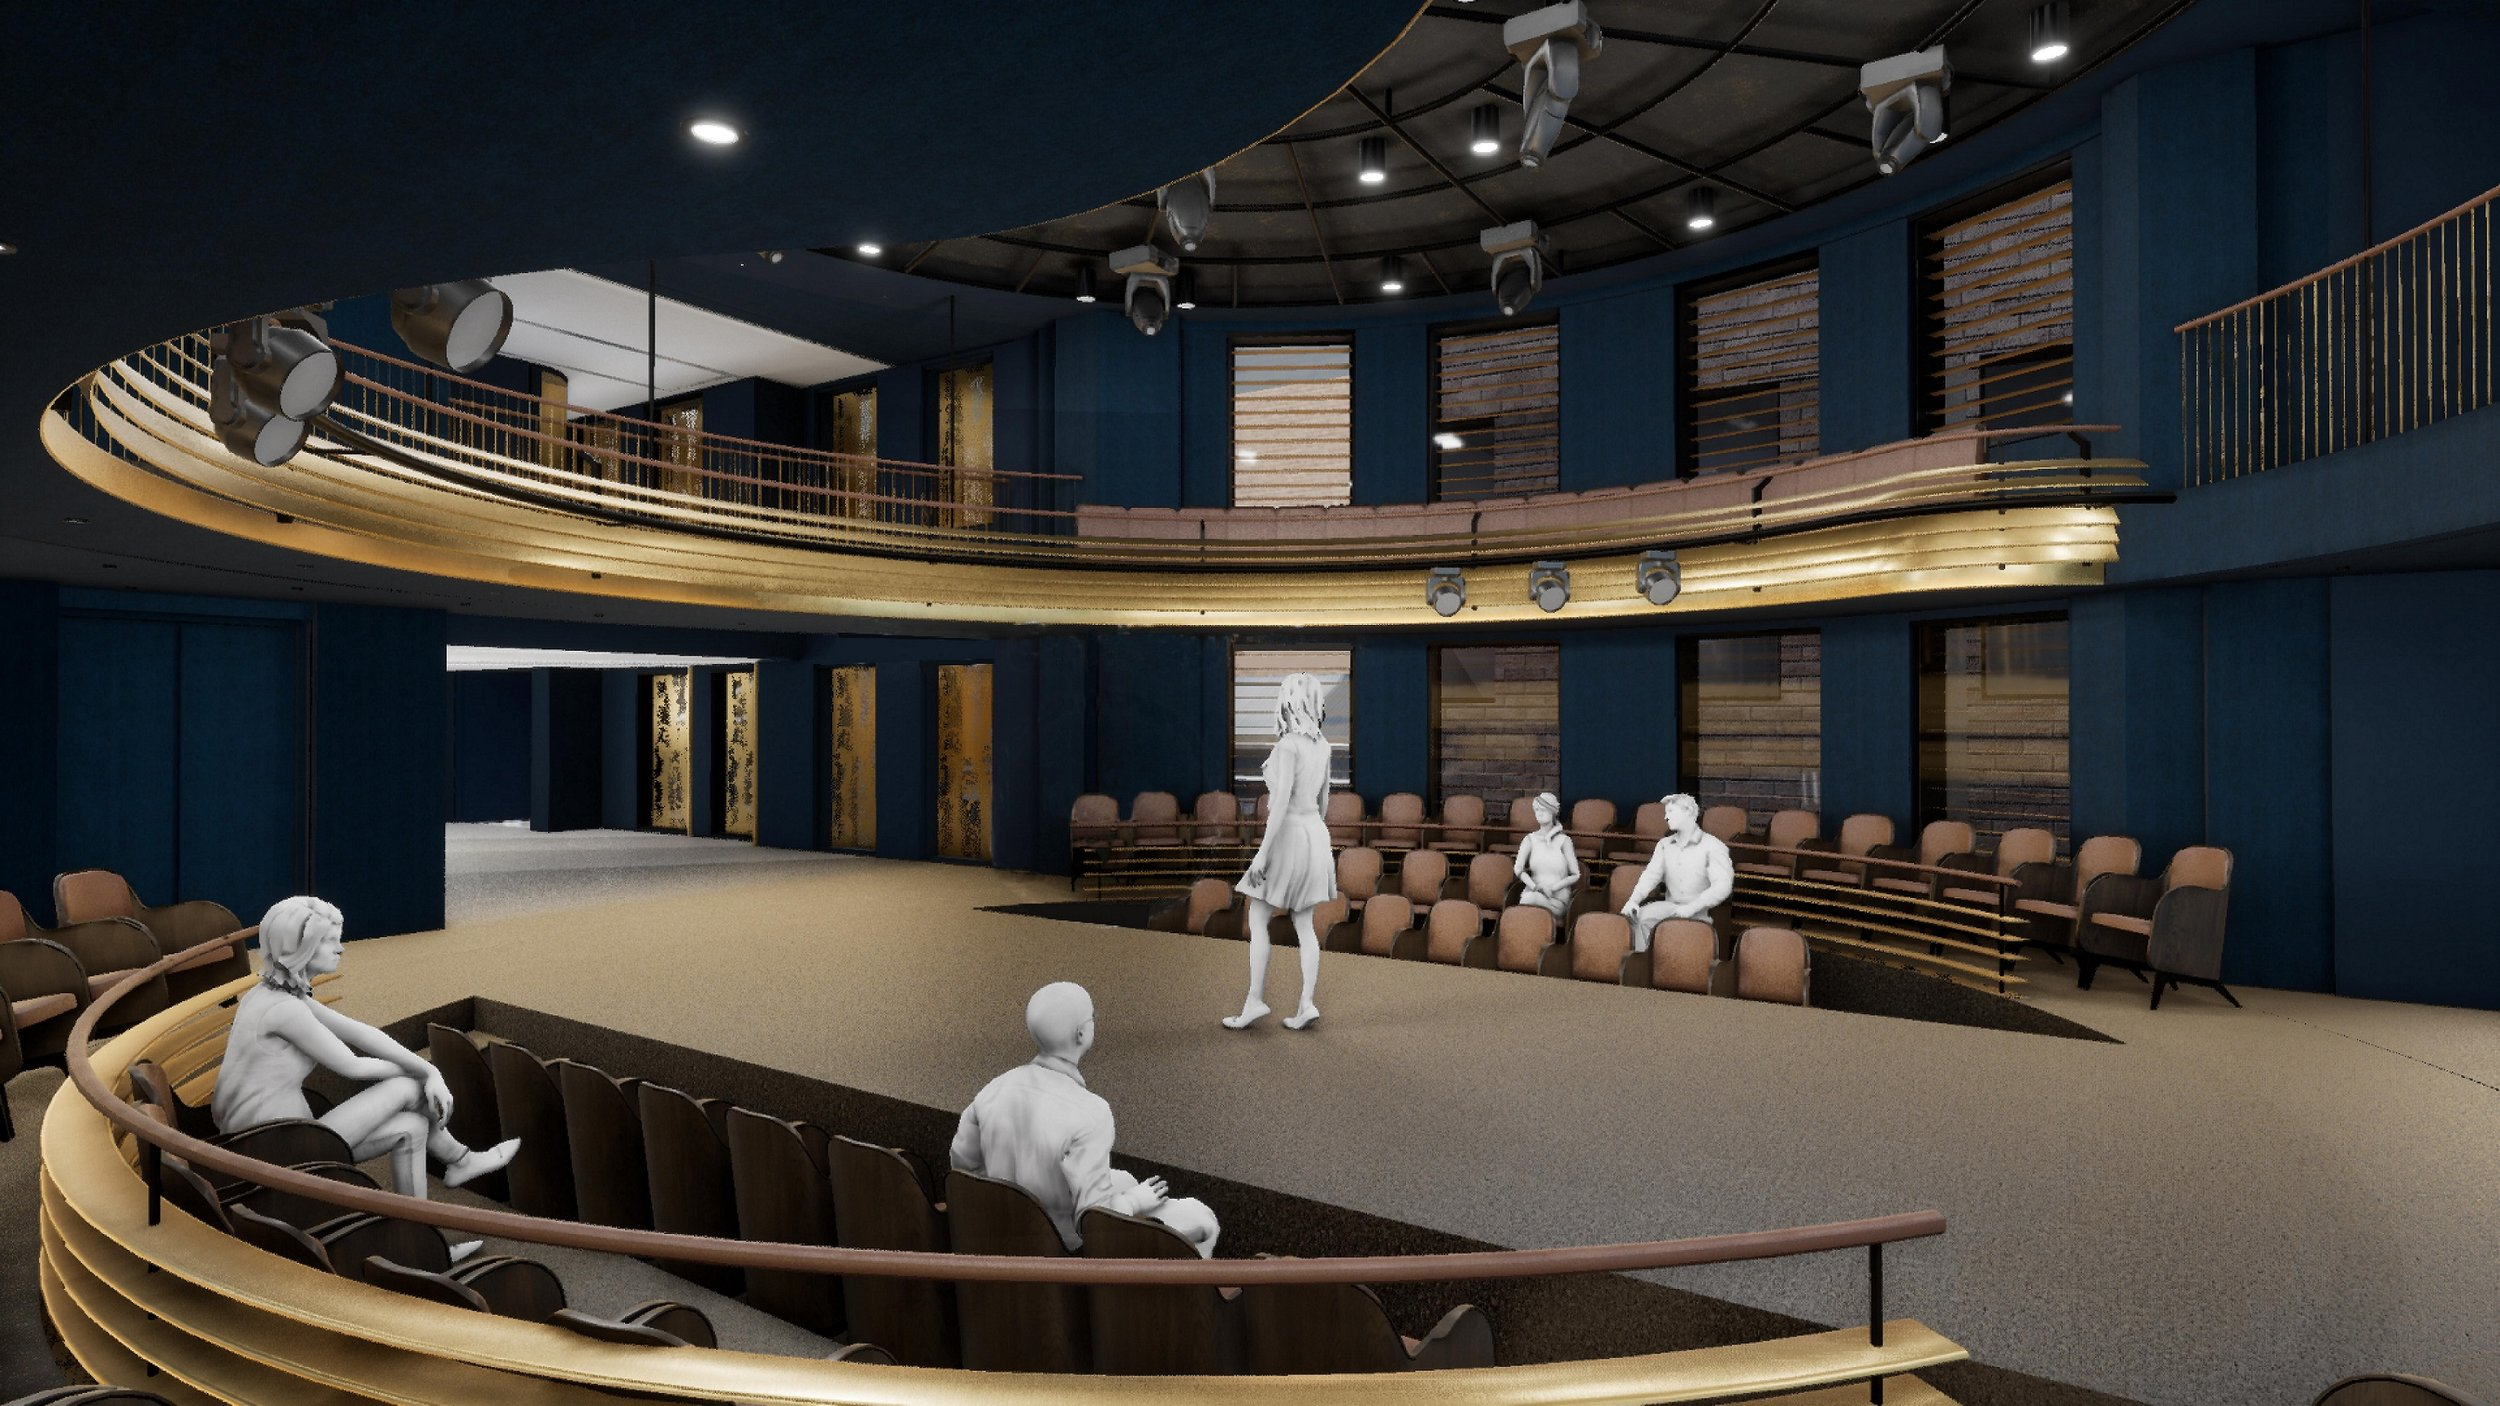 Artist-Impression-of-Boulevard-Theatre.-Credit-SODA-studio-4.jpg